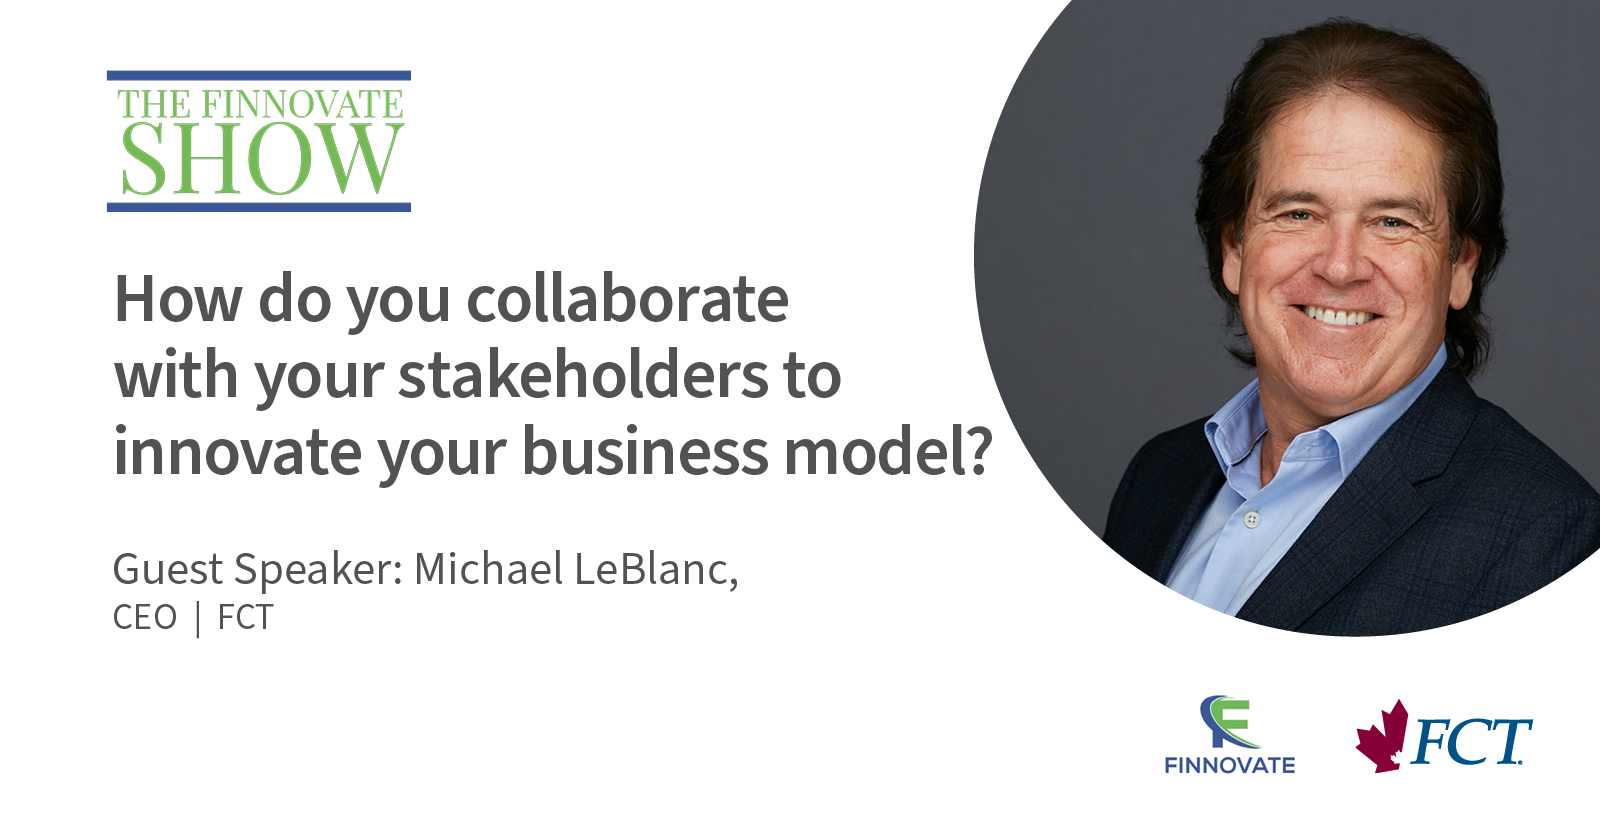 Michael LeBlanc, CEO of FCT